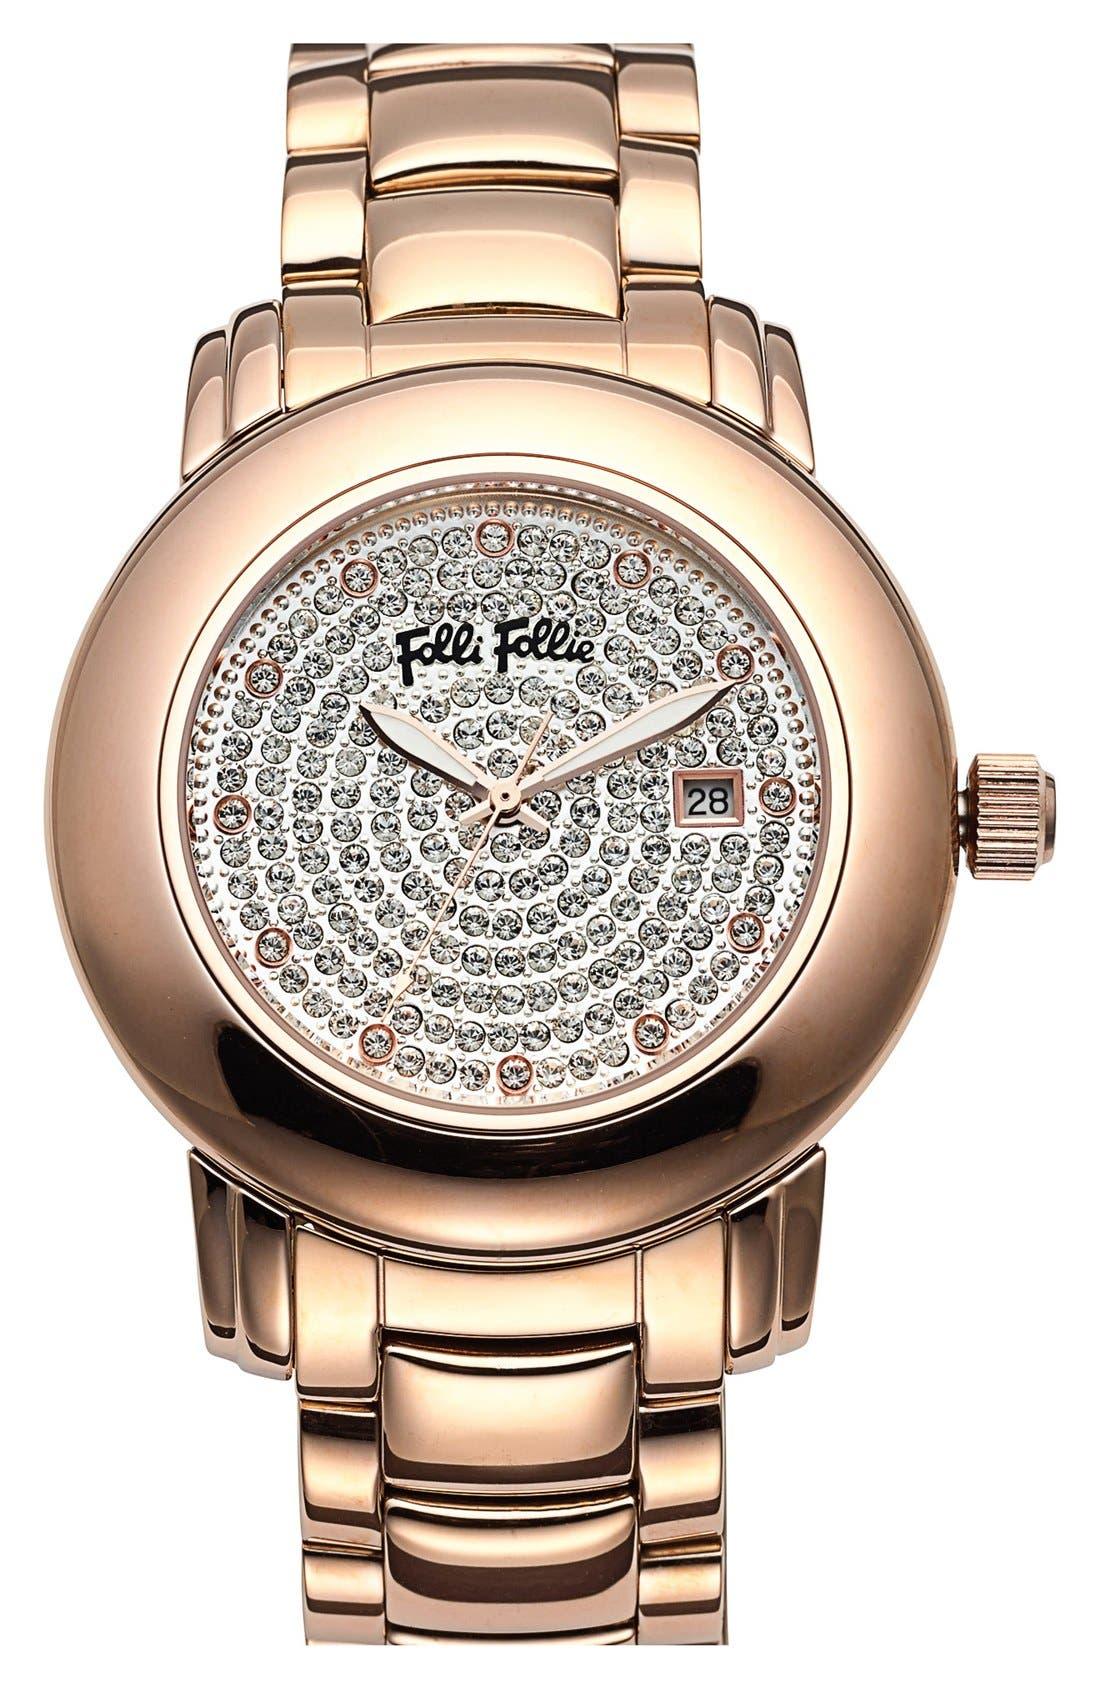 Main Image - Folli Follie 'Urban Spin' Crystal Dial Bracelet Watch, 43mm